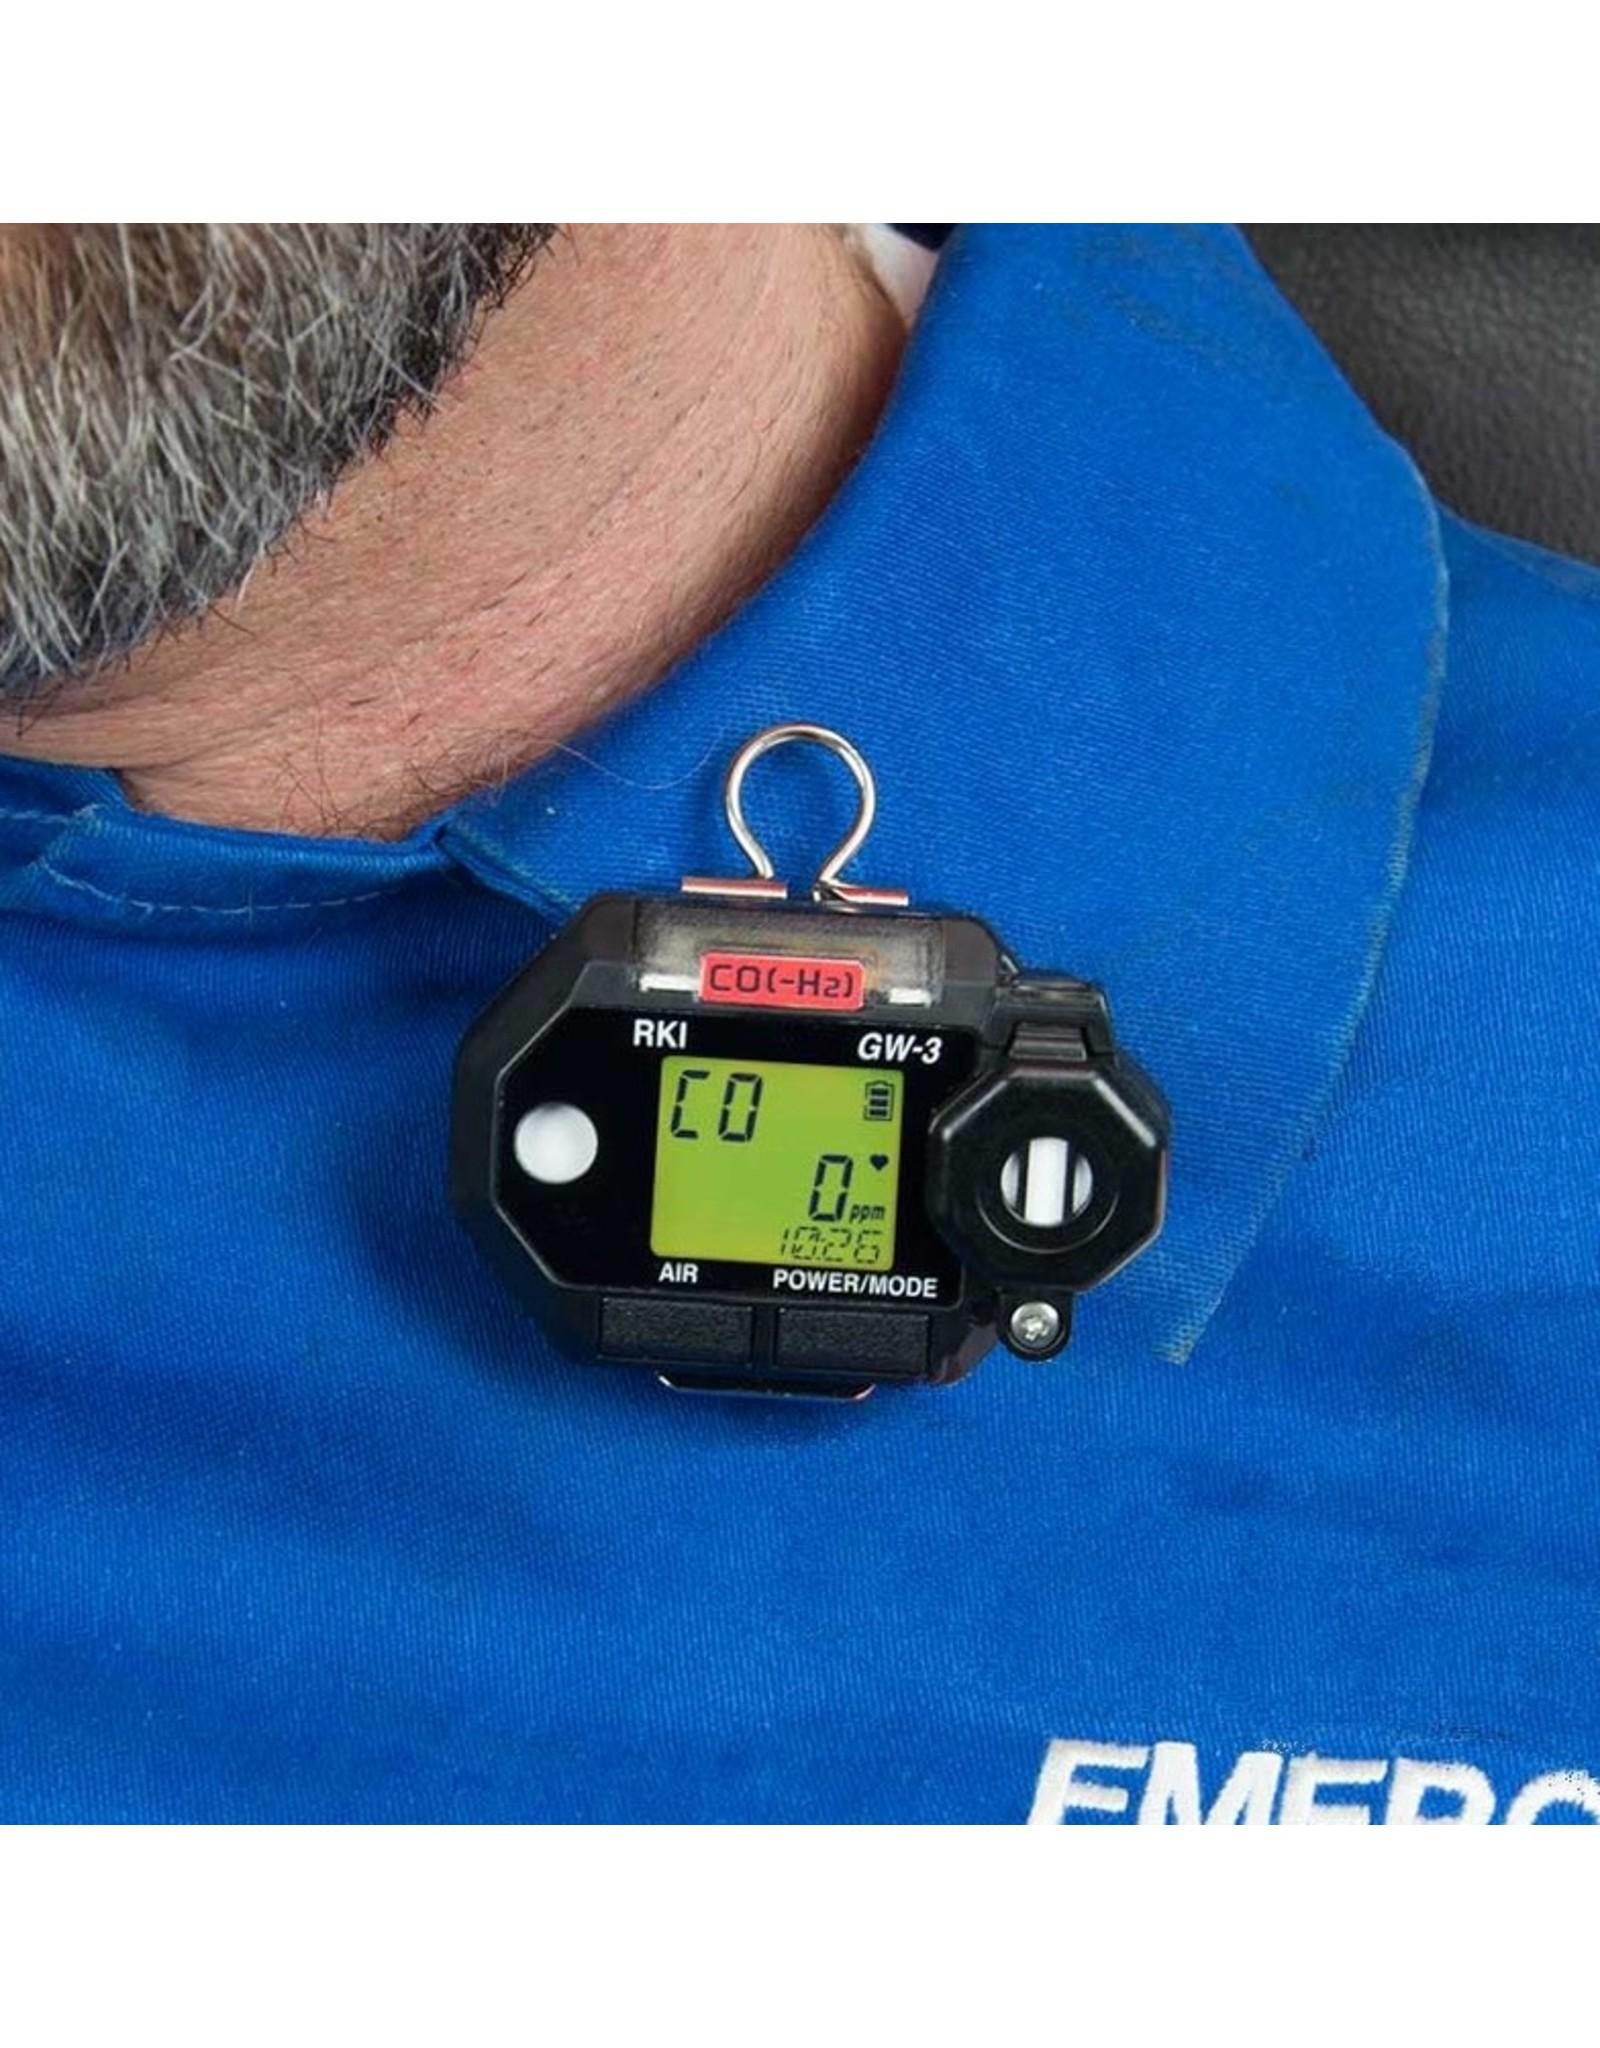 RKI Instruments GasWatch 3 – Portable Single Gas Monitor, H2S with Alligator clip